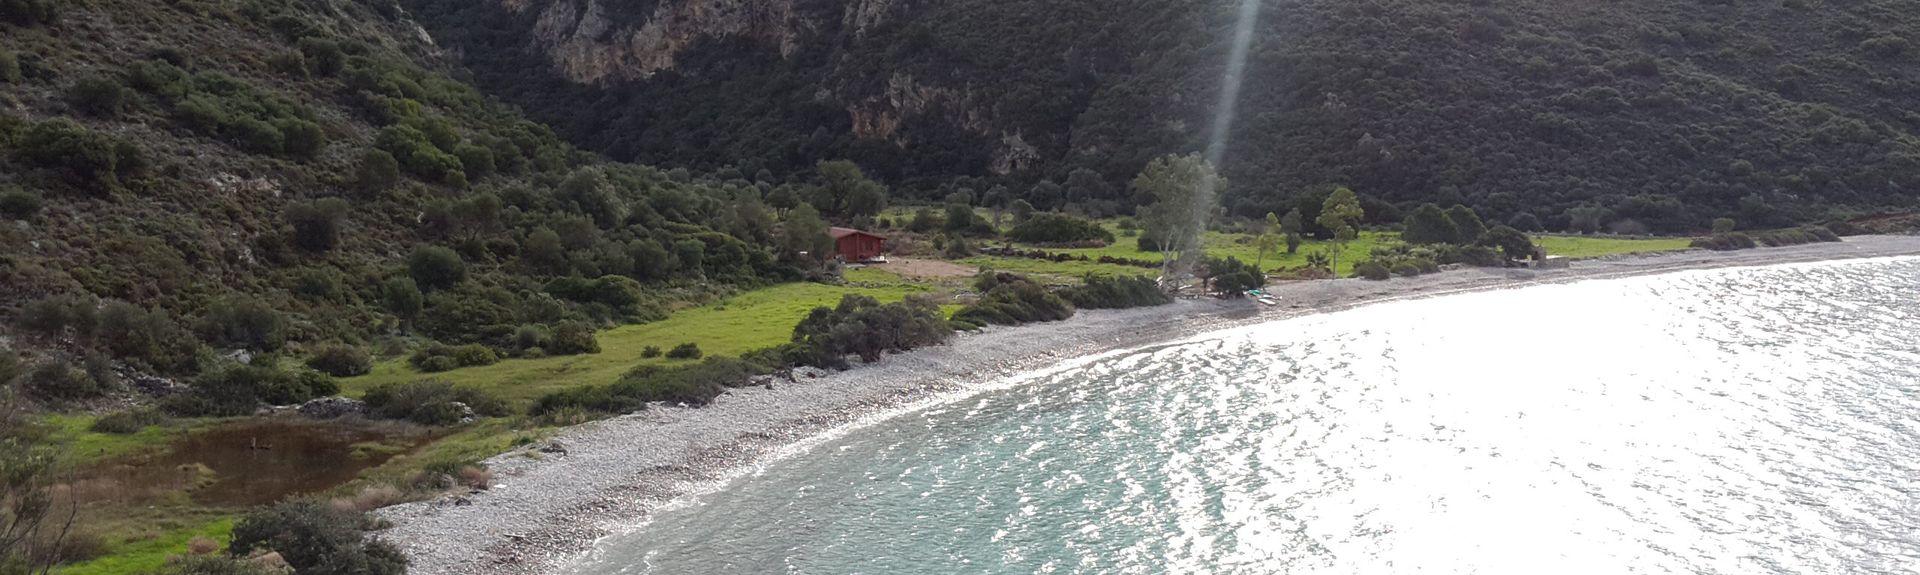 Selimiye Köyü, Turkey